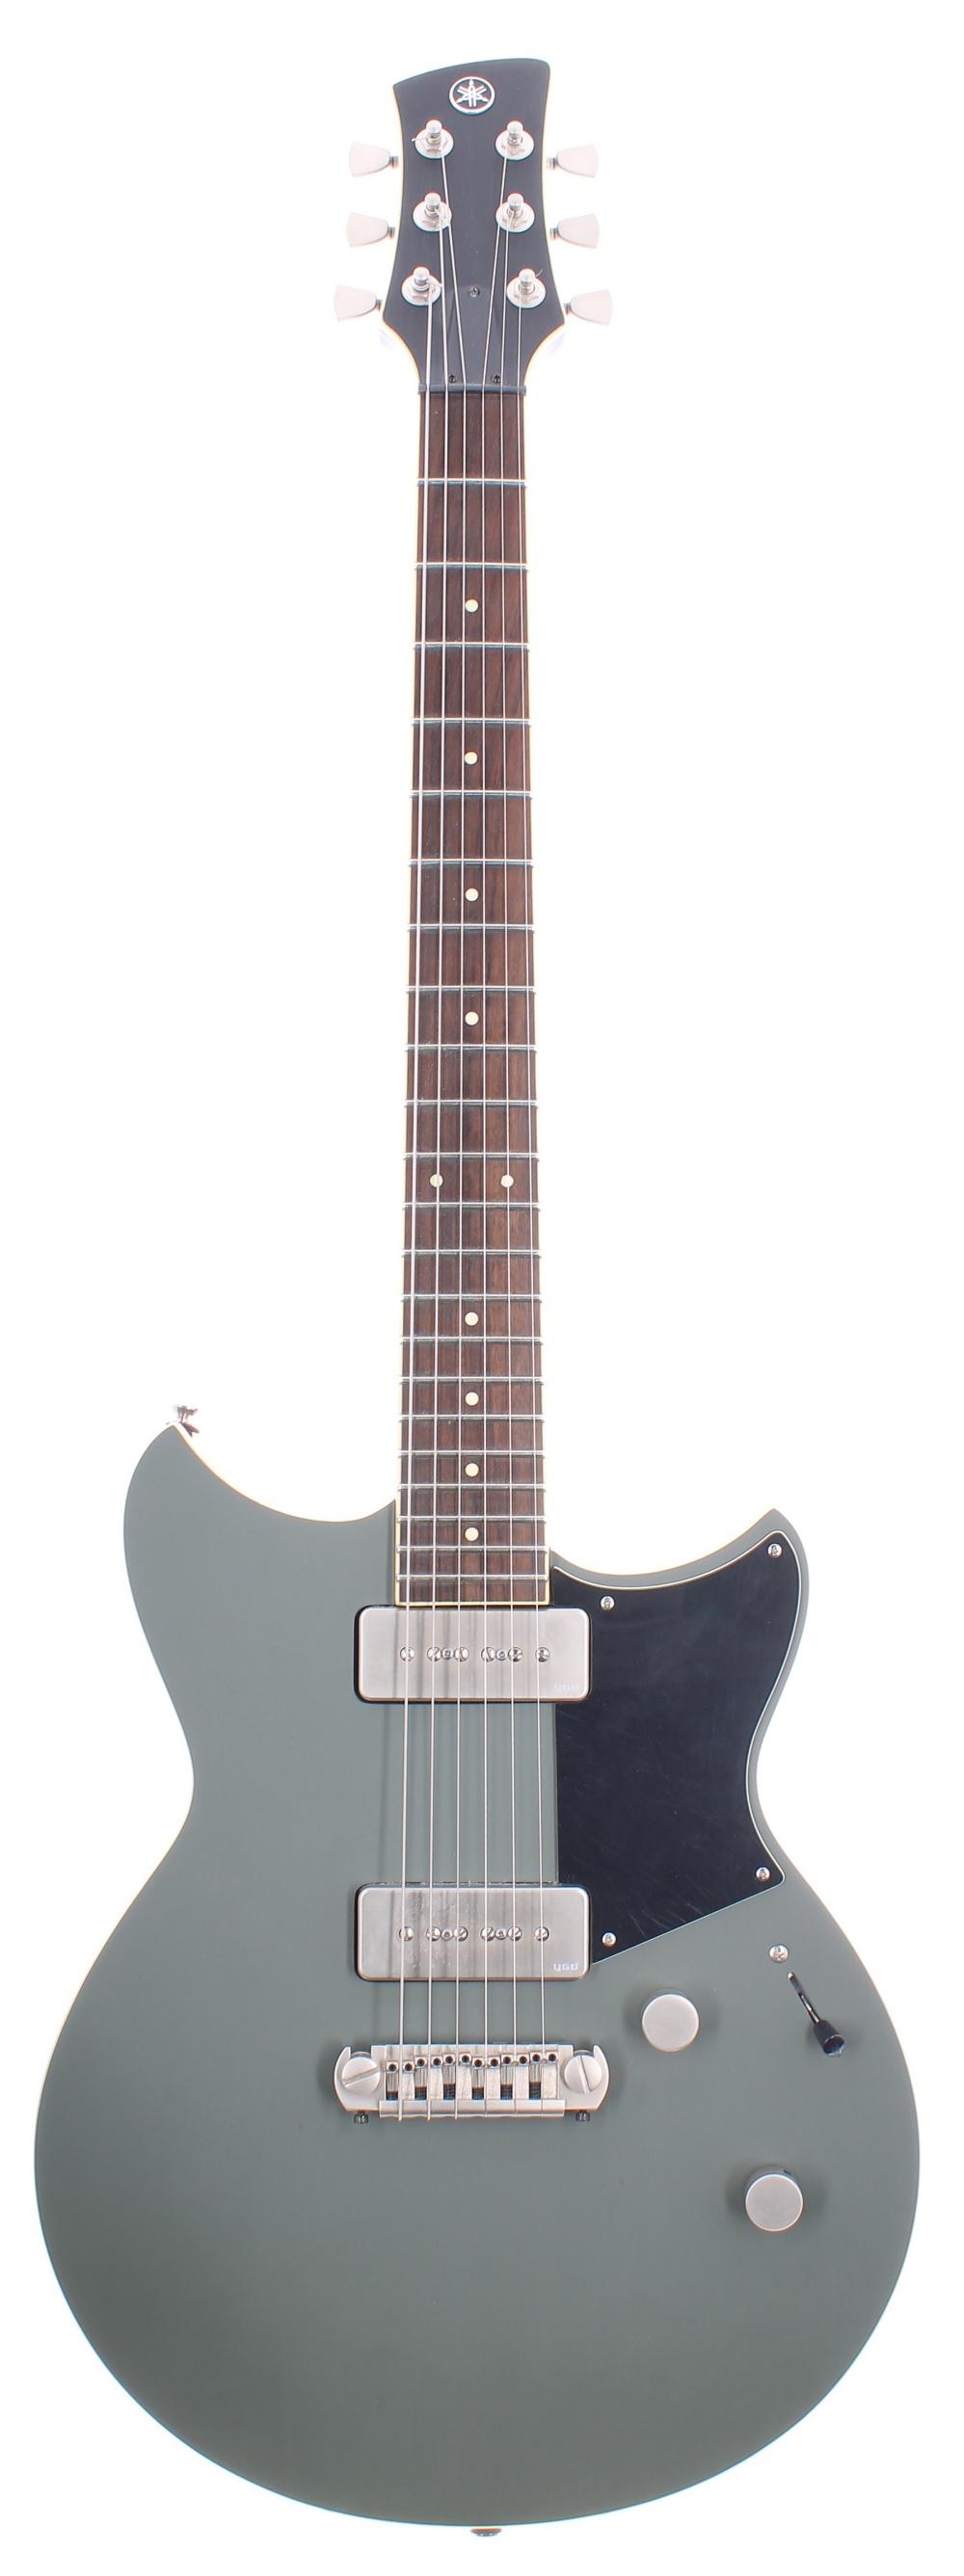 2016 Yamaha Revstar RS502 electric guitar made in Indonesia, ser. no. HMLxxxxW; Finish: satin